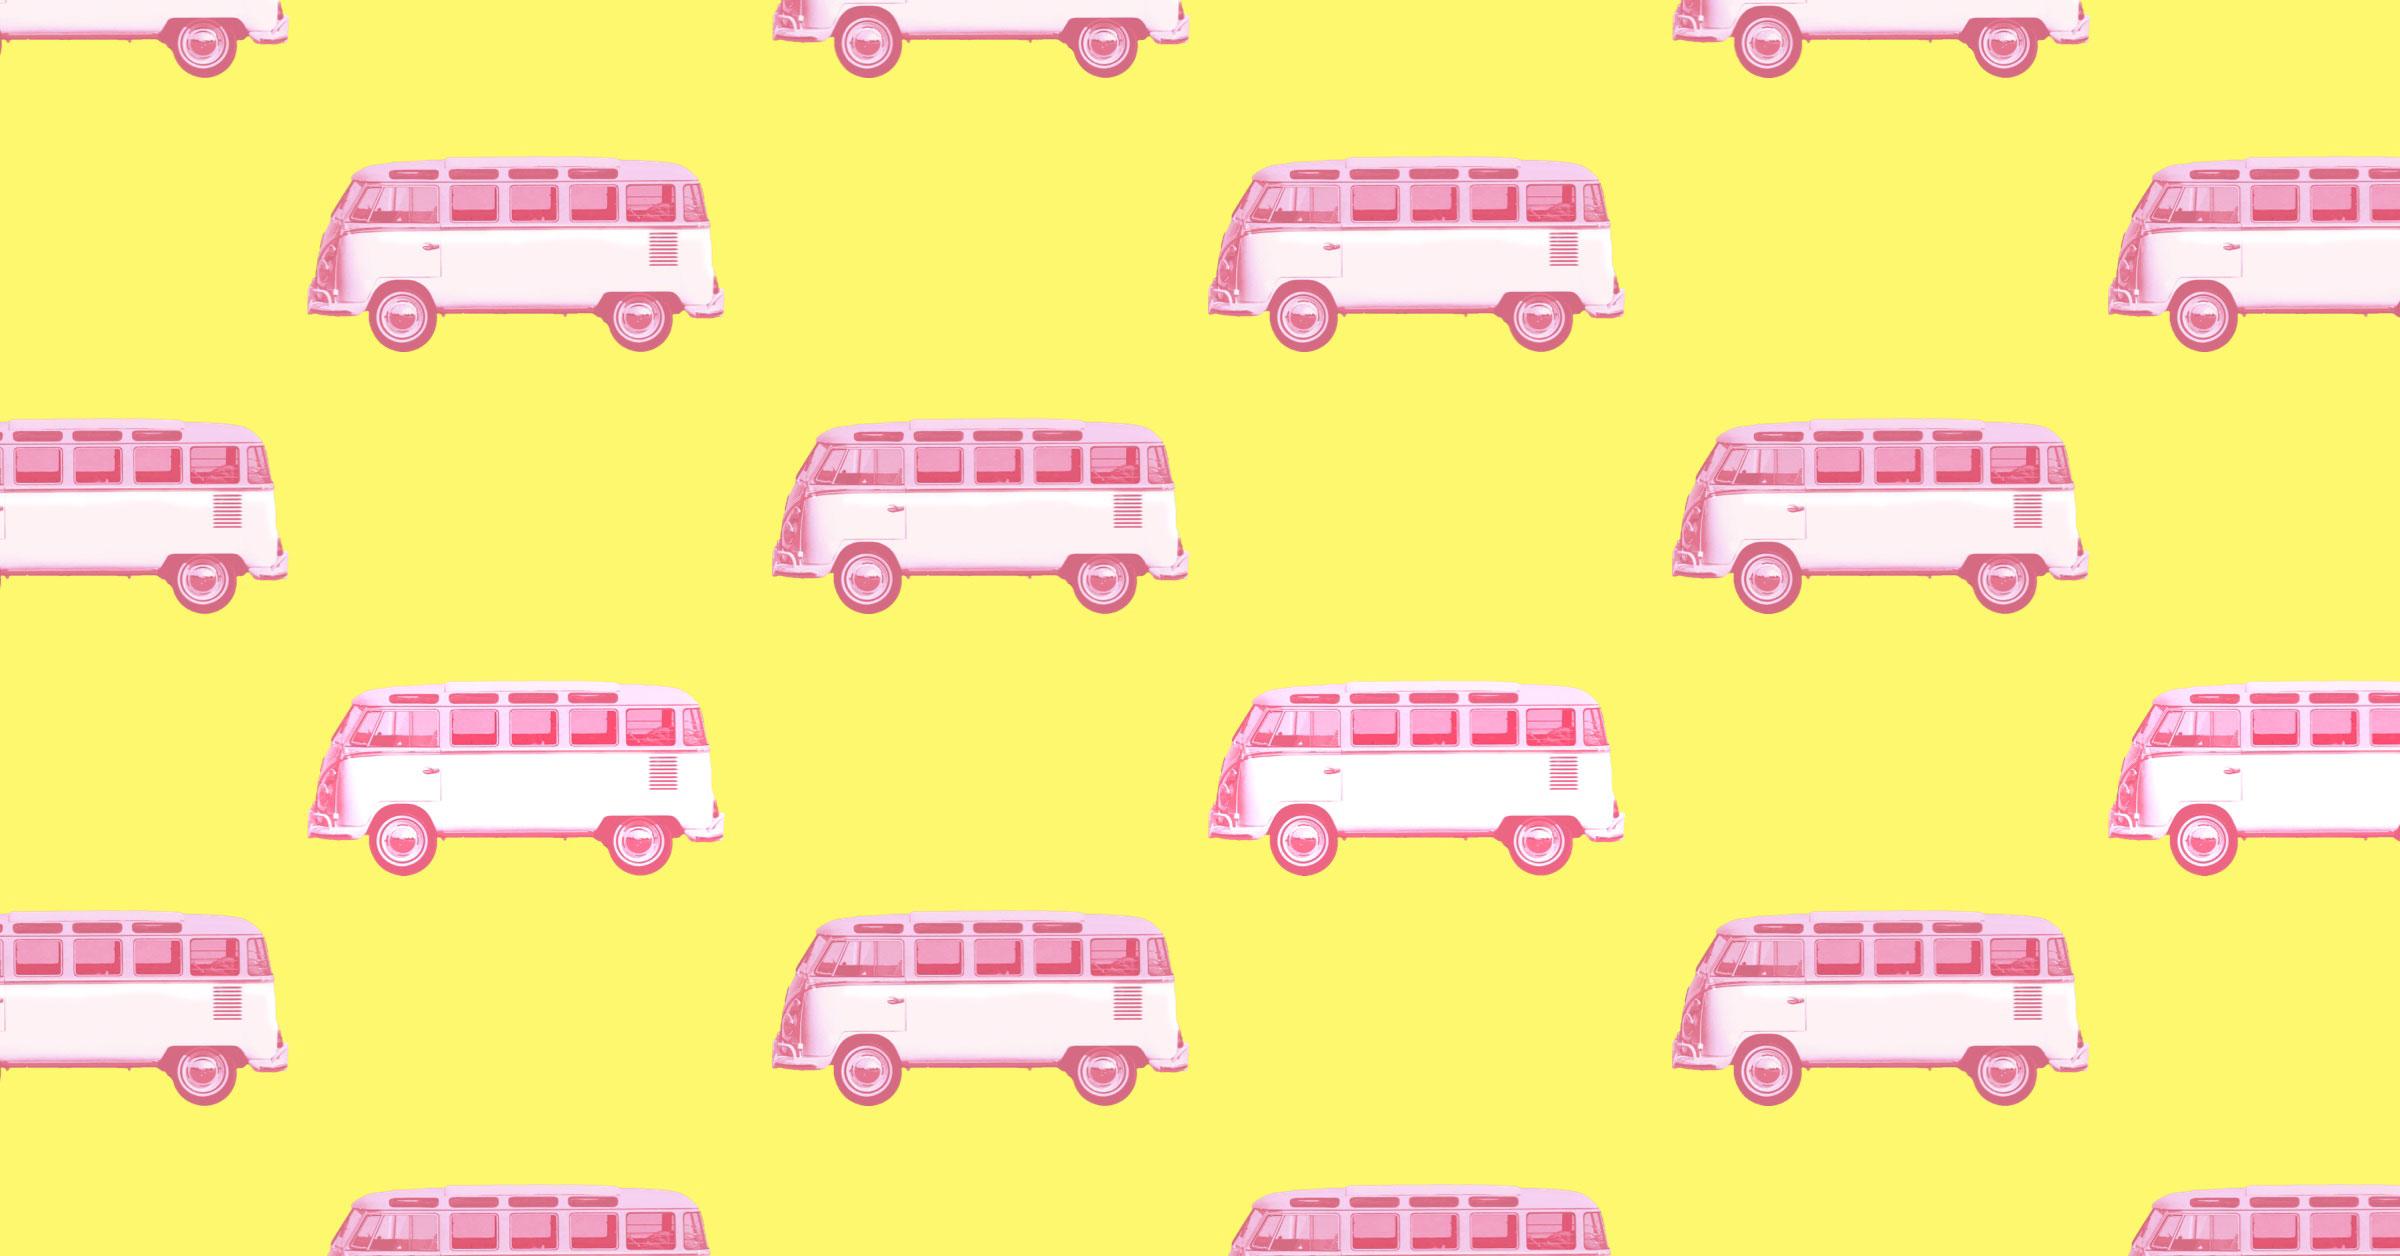 Pink camper van on yellow background